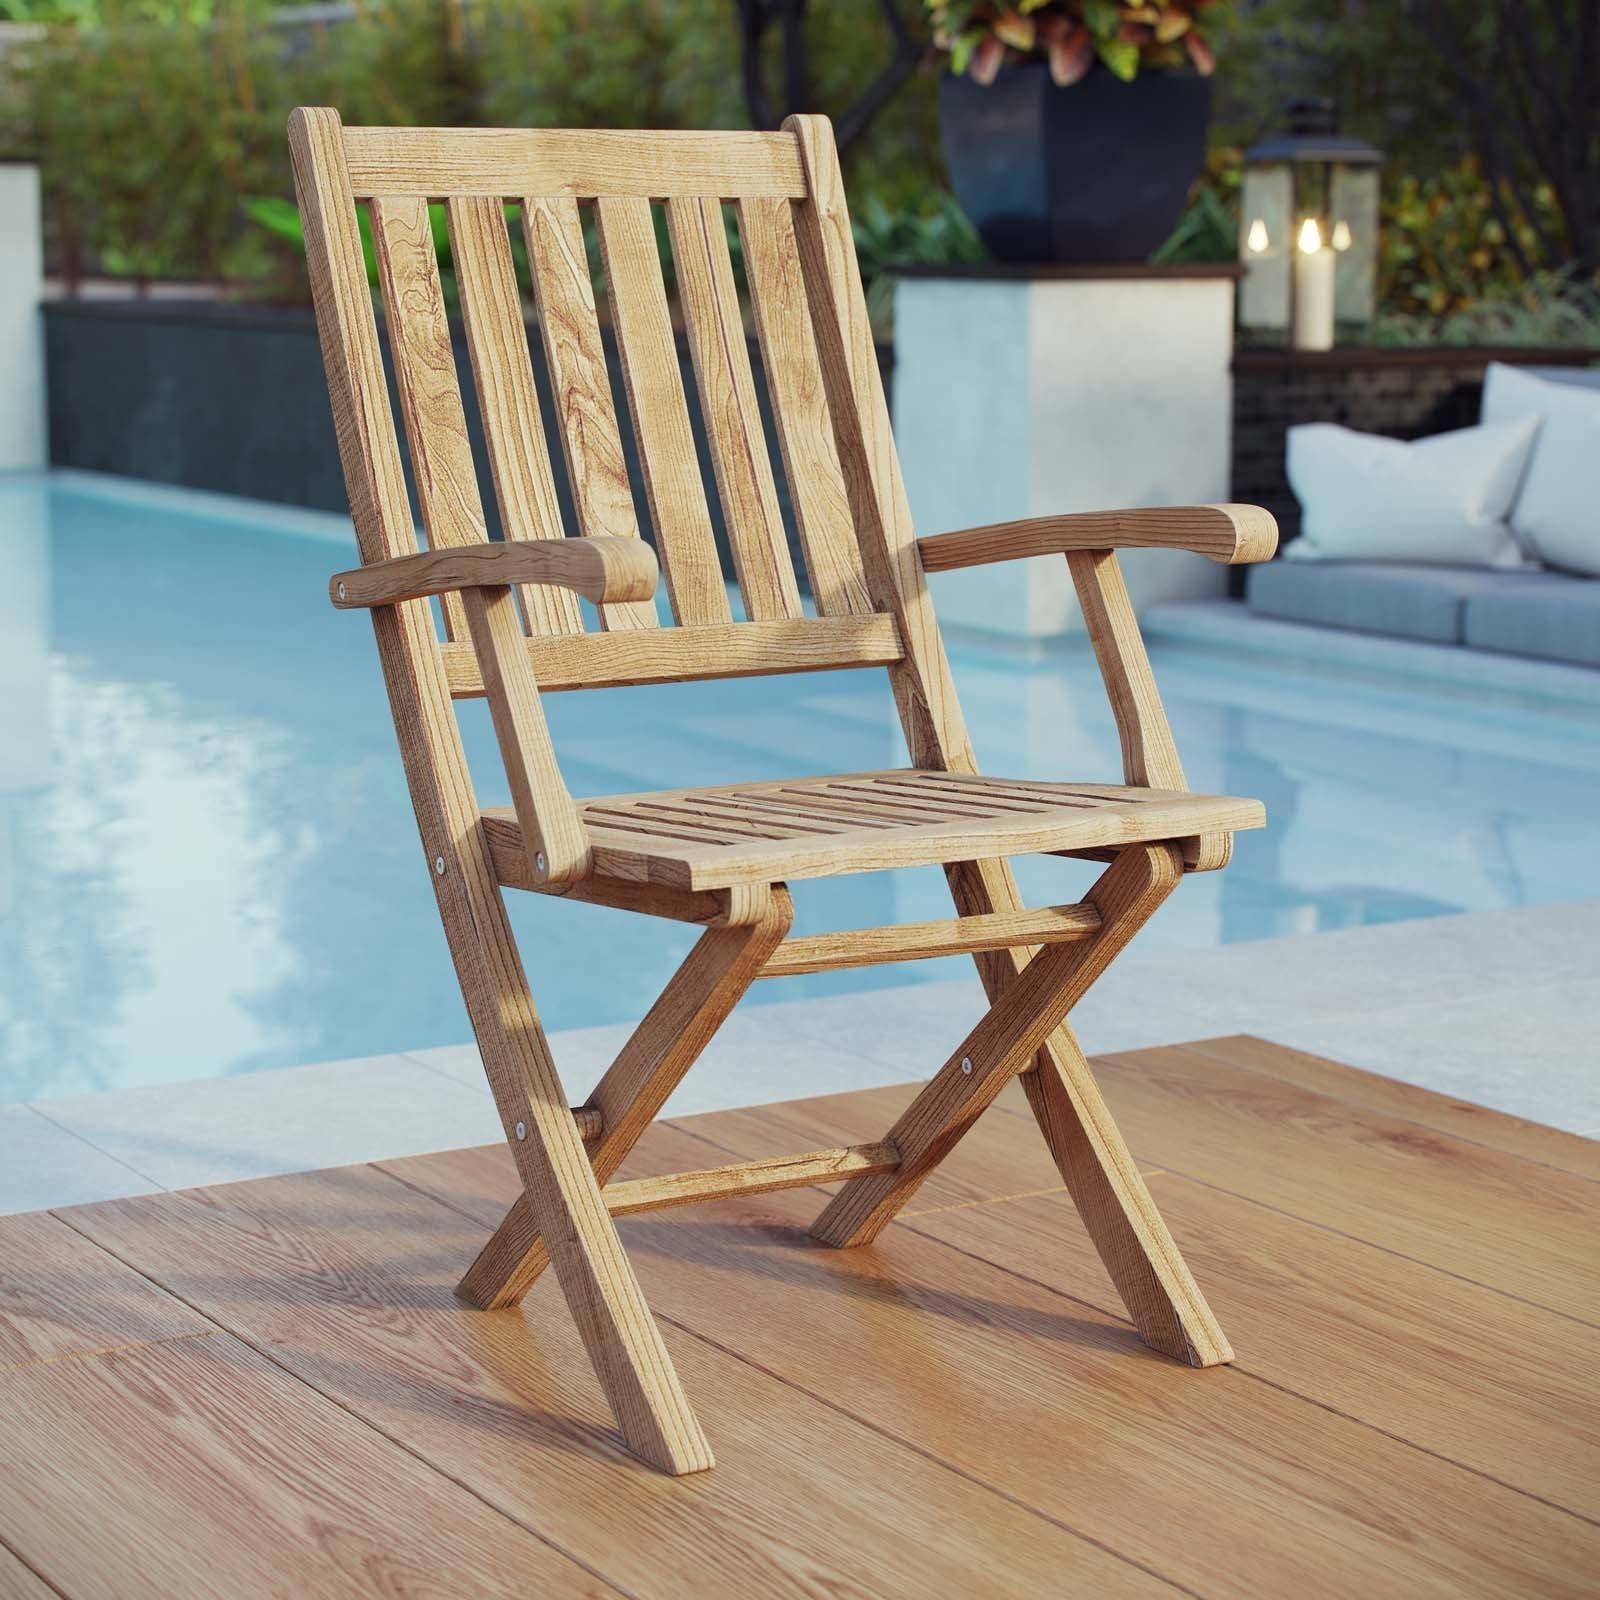 teak folding chair men s valet furniture shop marina outdoor patio on sale free